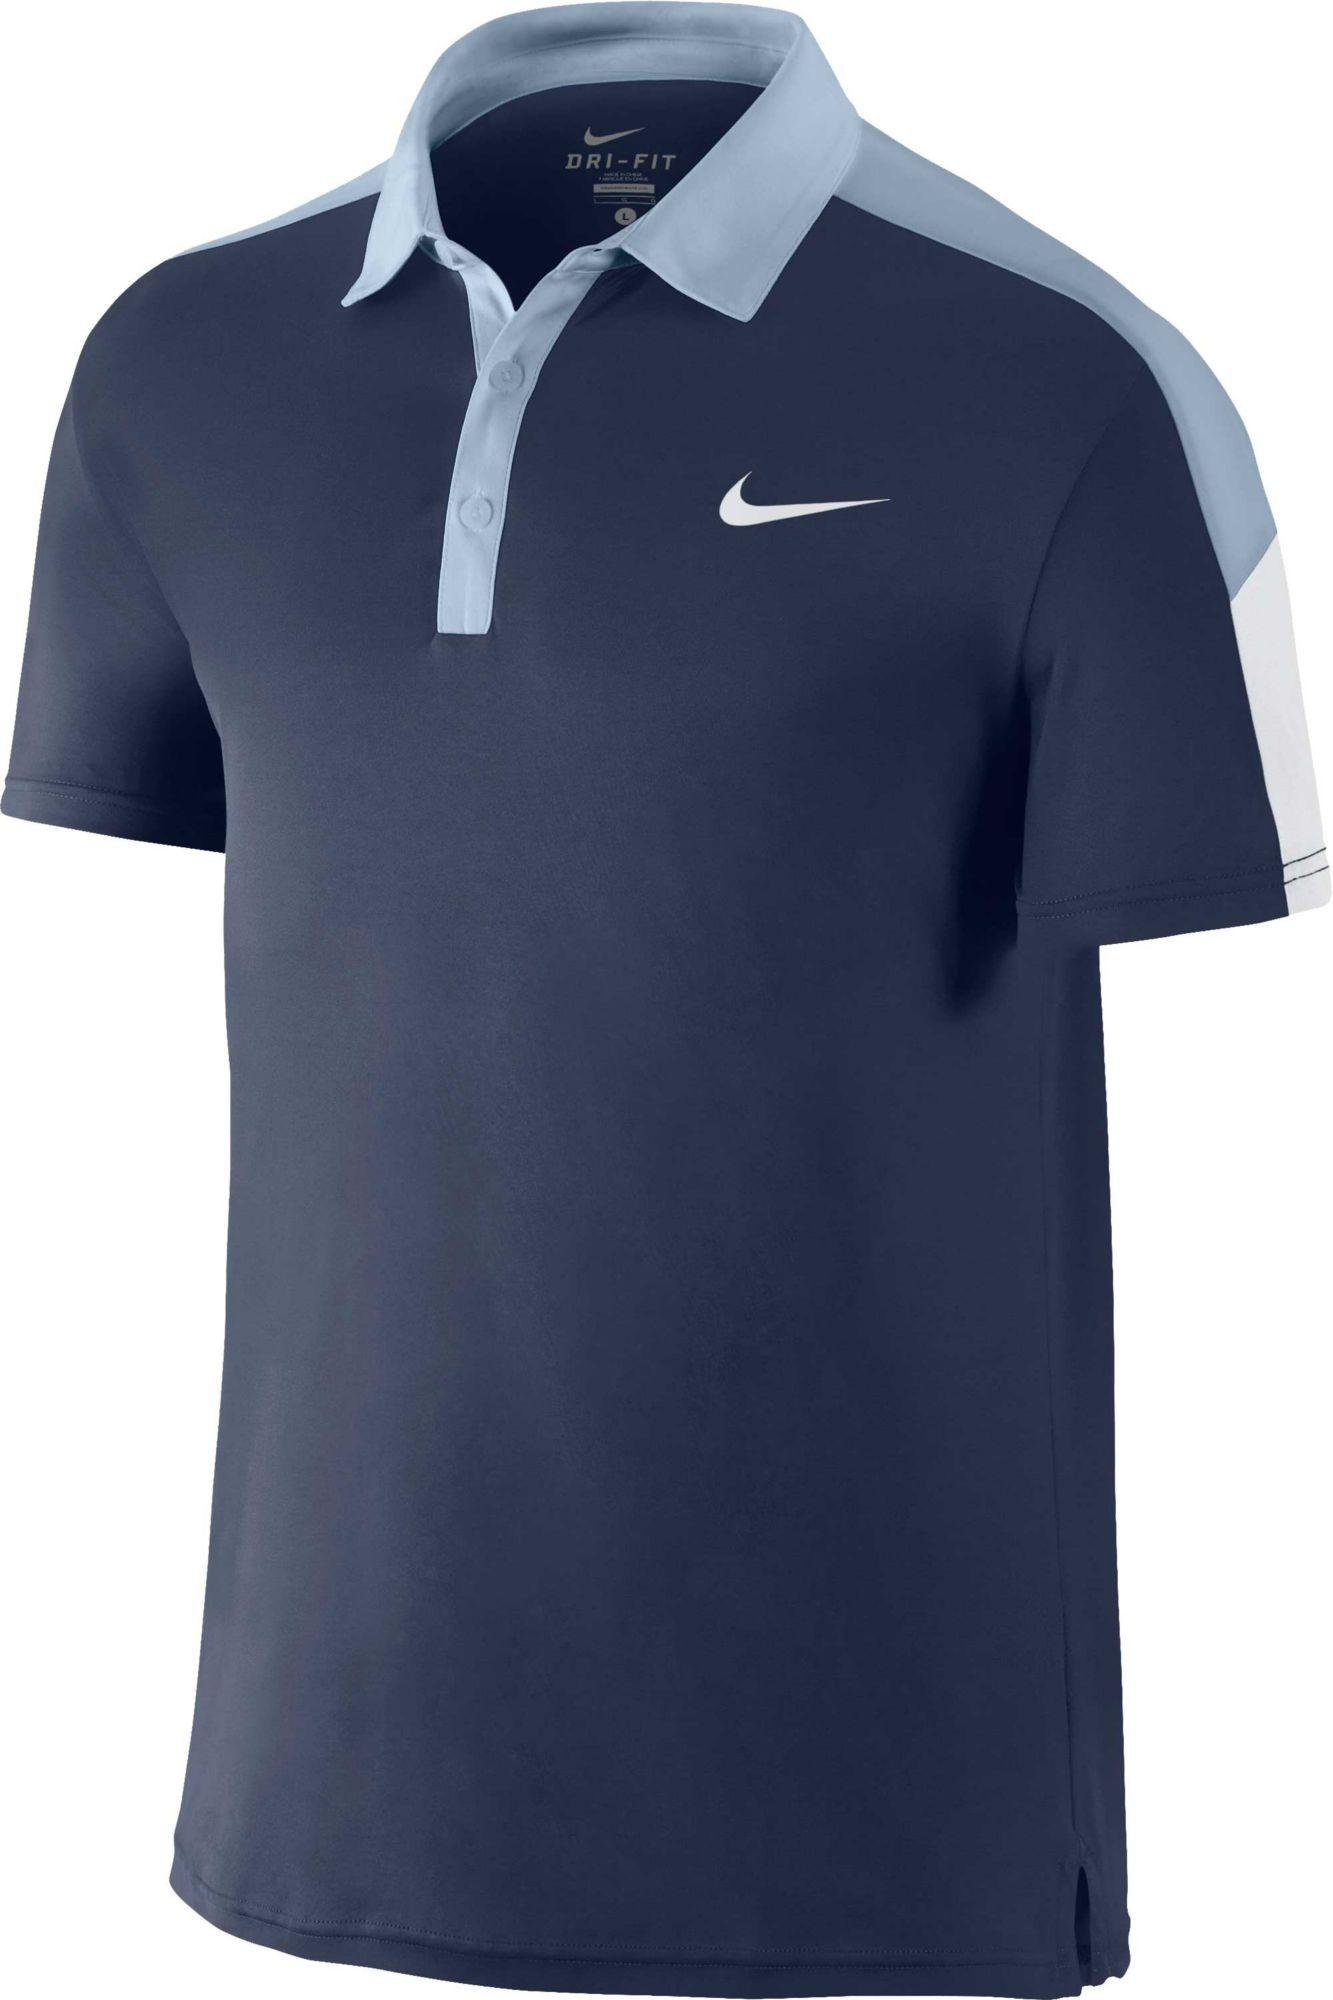 tennis nike shirt